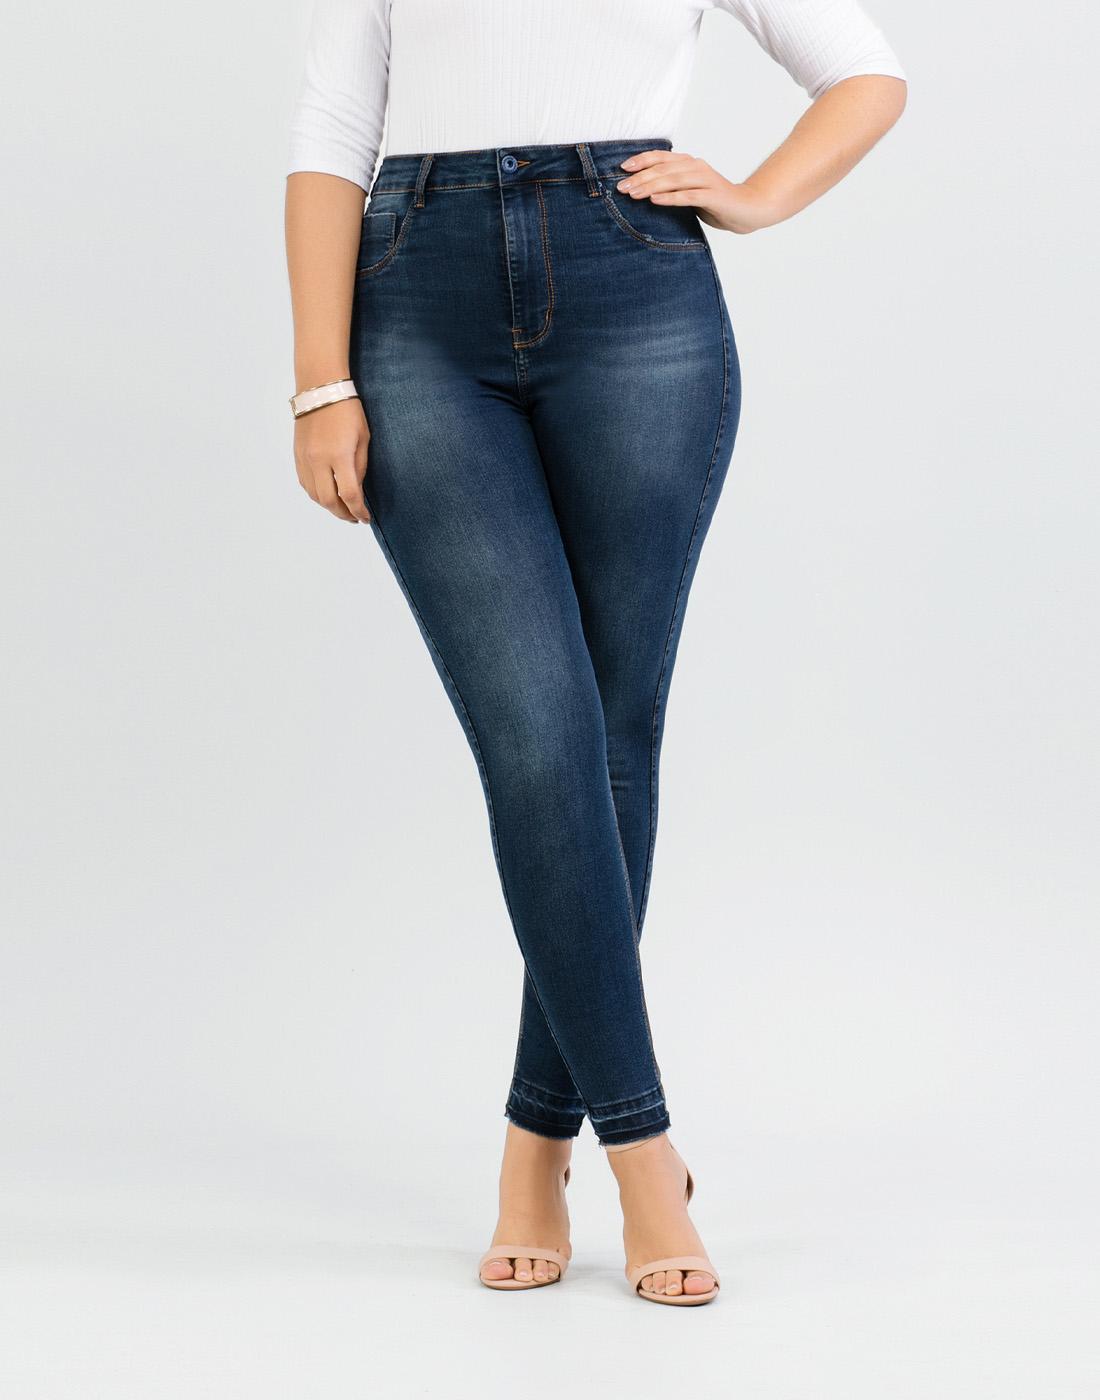 Calça Jeans Skinny Cint. Media Fit For Me Lunender Mais Mulher